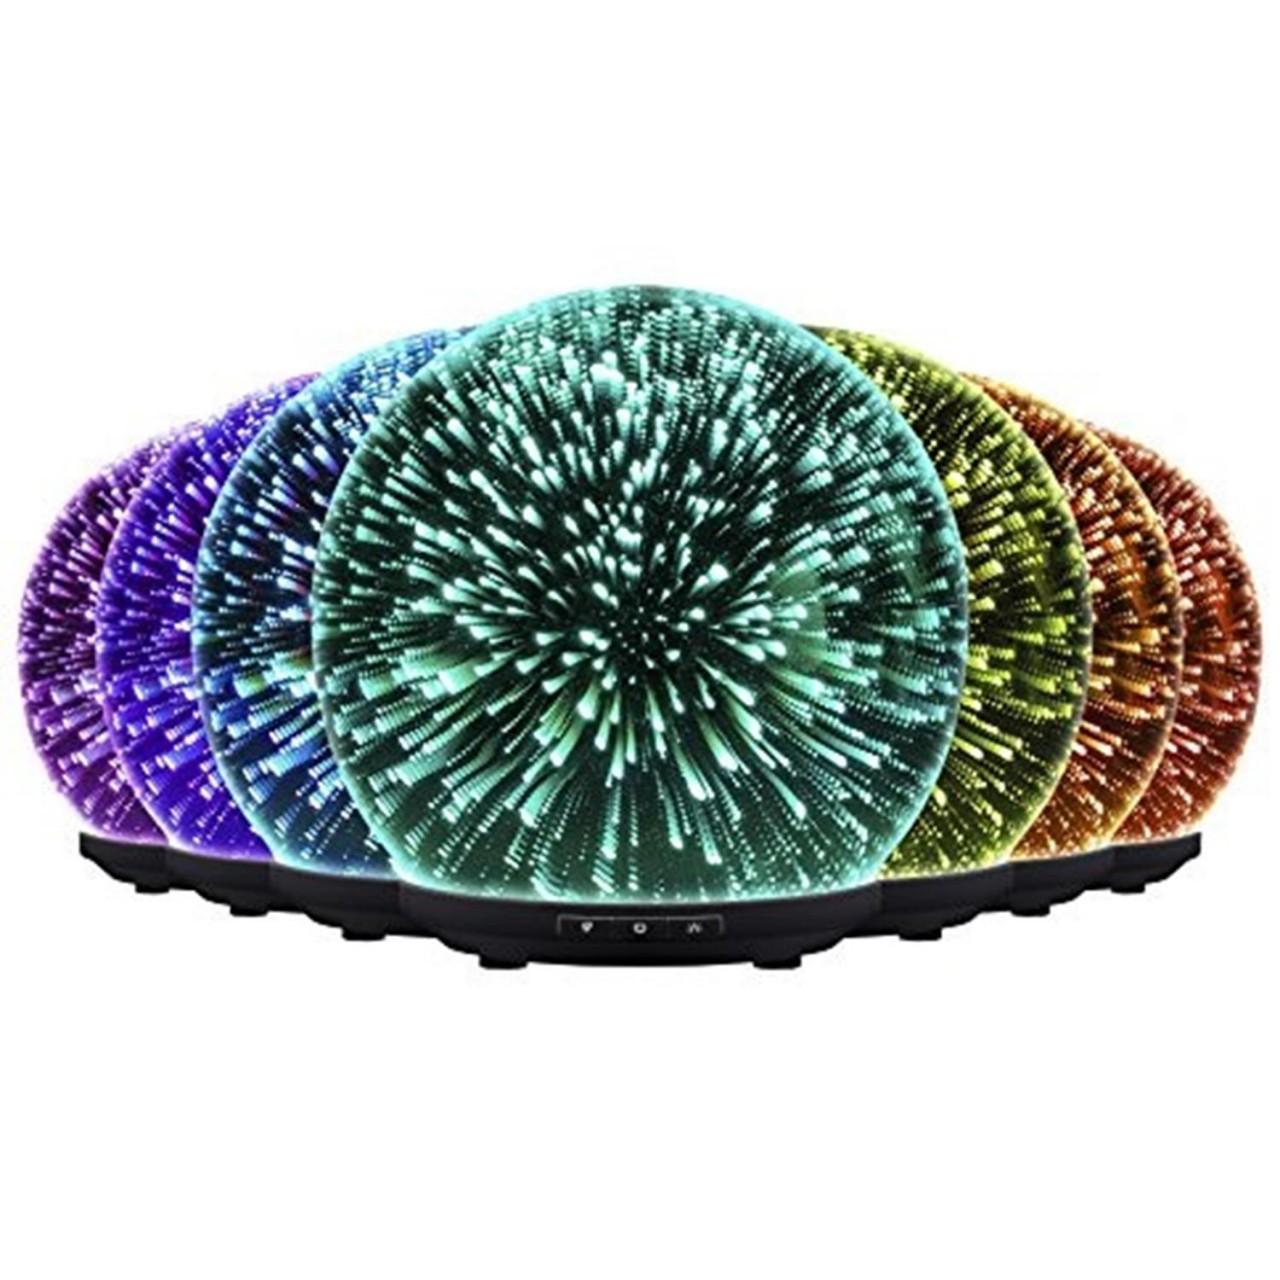 Aroma Diffuser Likemylux 200ml Luftbefeuchter Duftlampe Öl Düfte LED 7 Farben